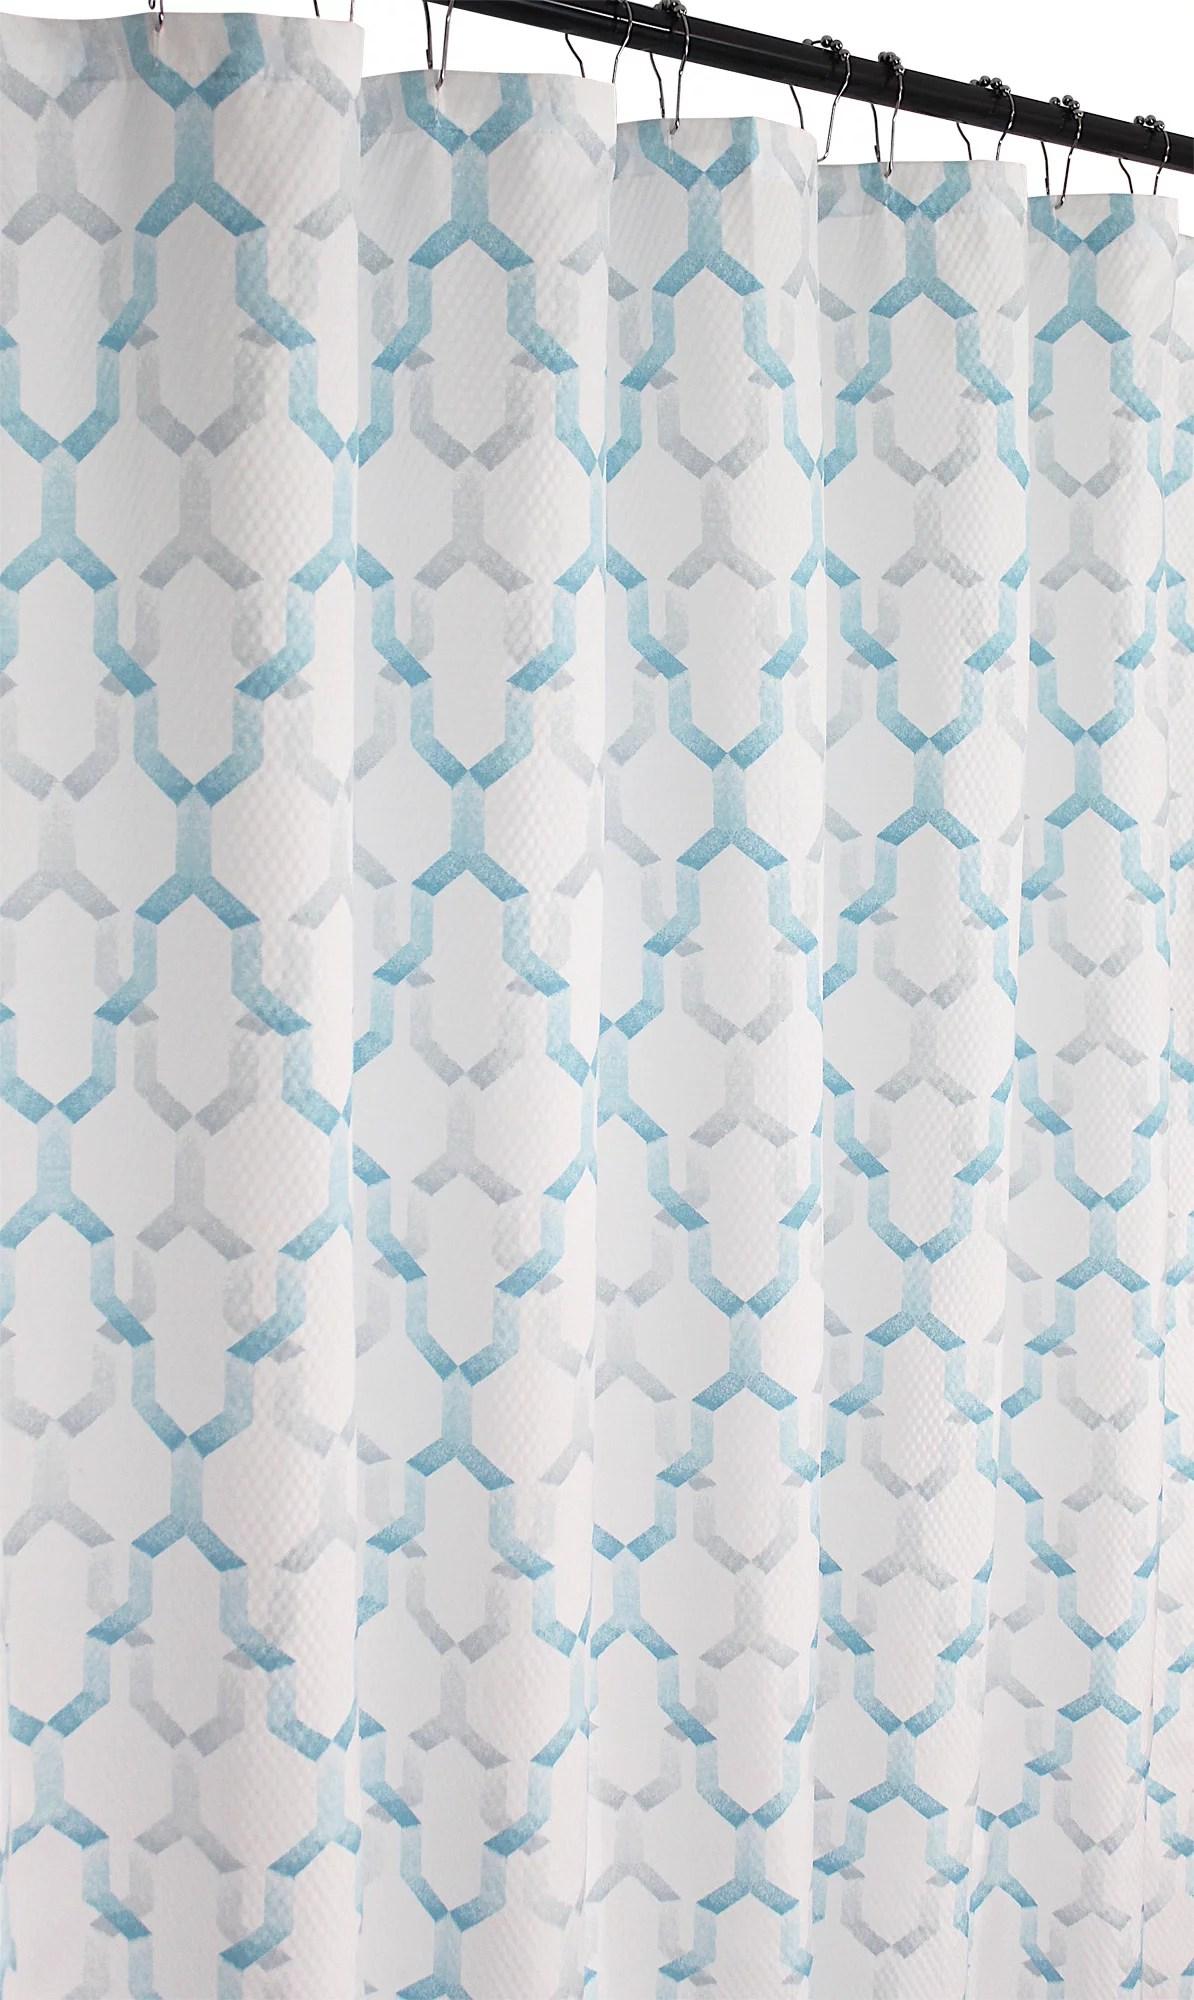 aqua blue and white lattice shower curtain for bathroom fabric microfiber embossed